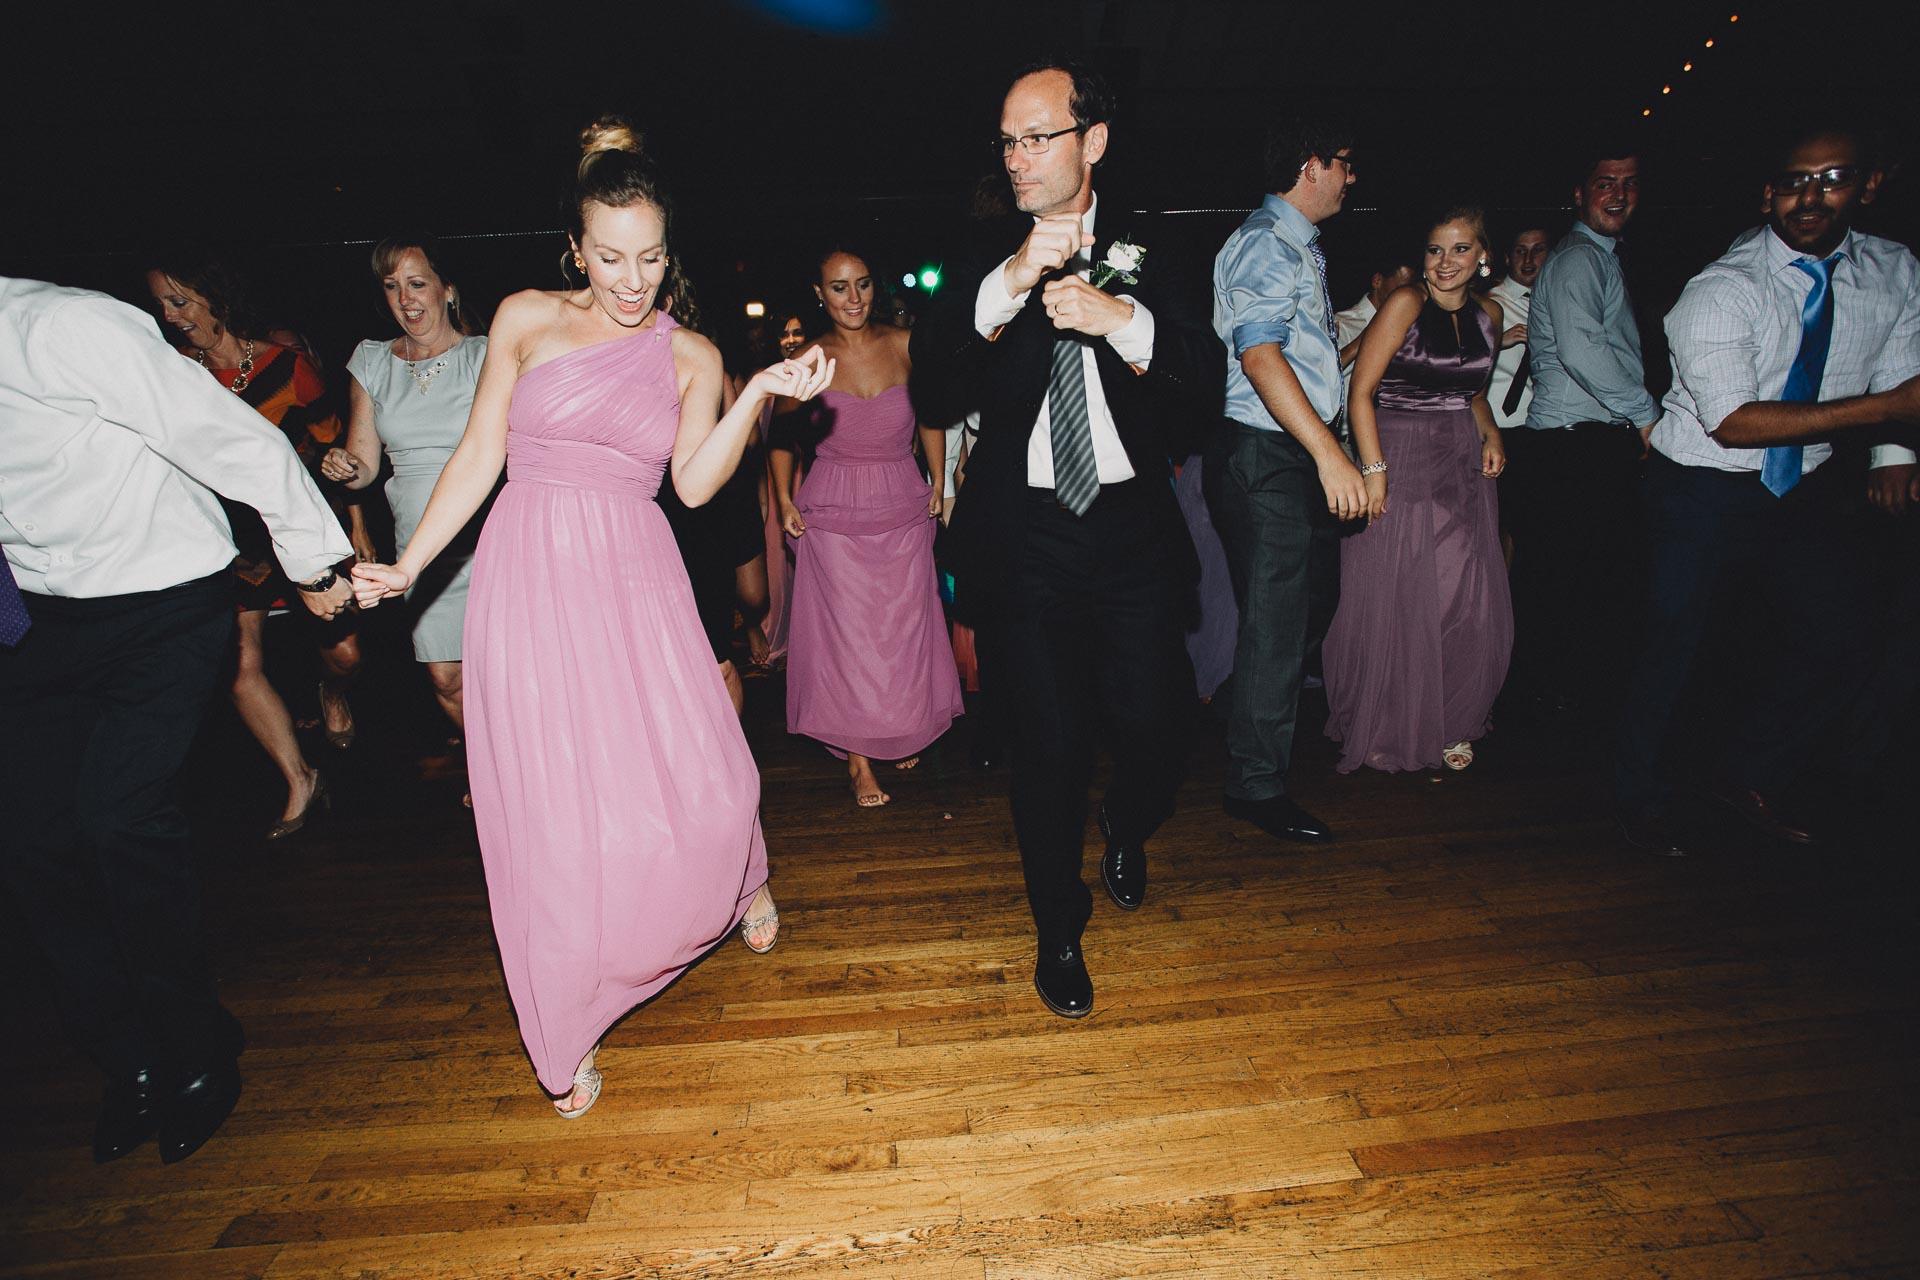 Julia-Michael-Cincinnati-Music-Hall-Wedding-139@2x.jpg